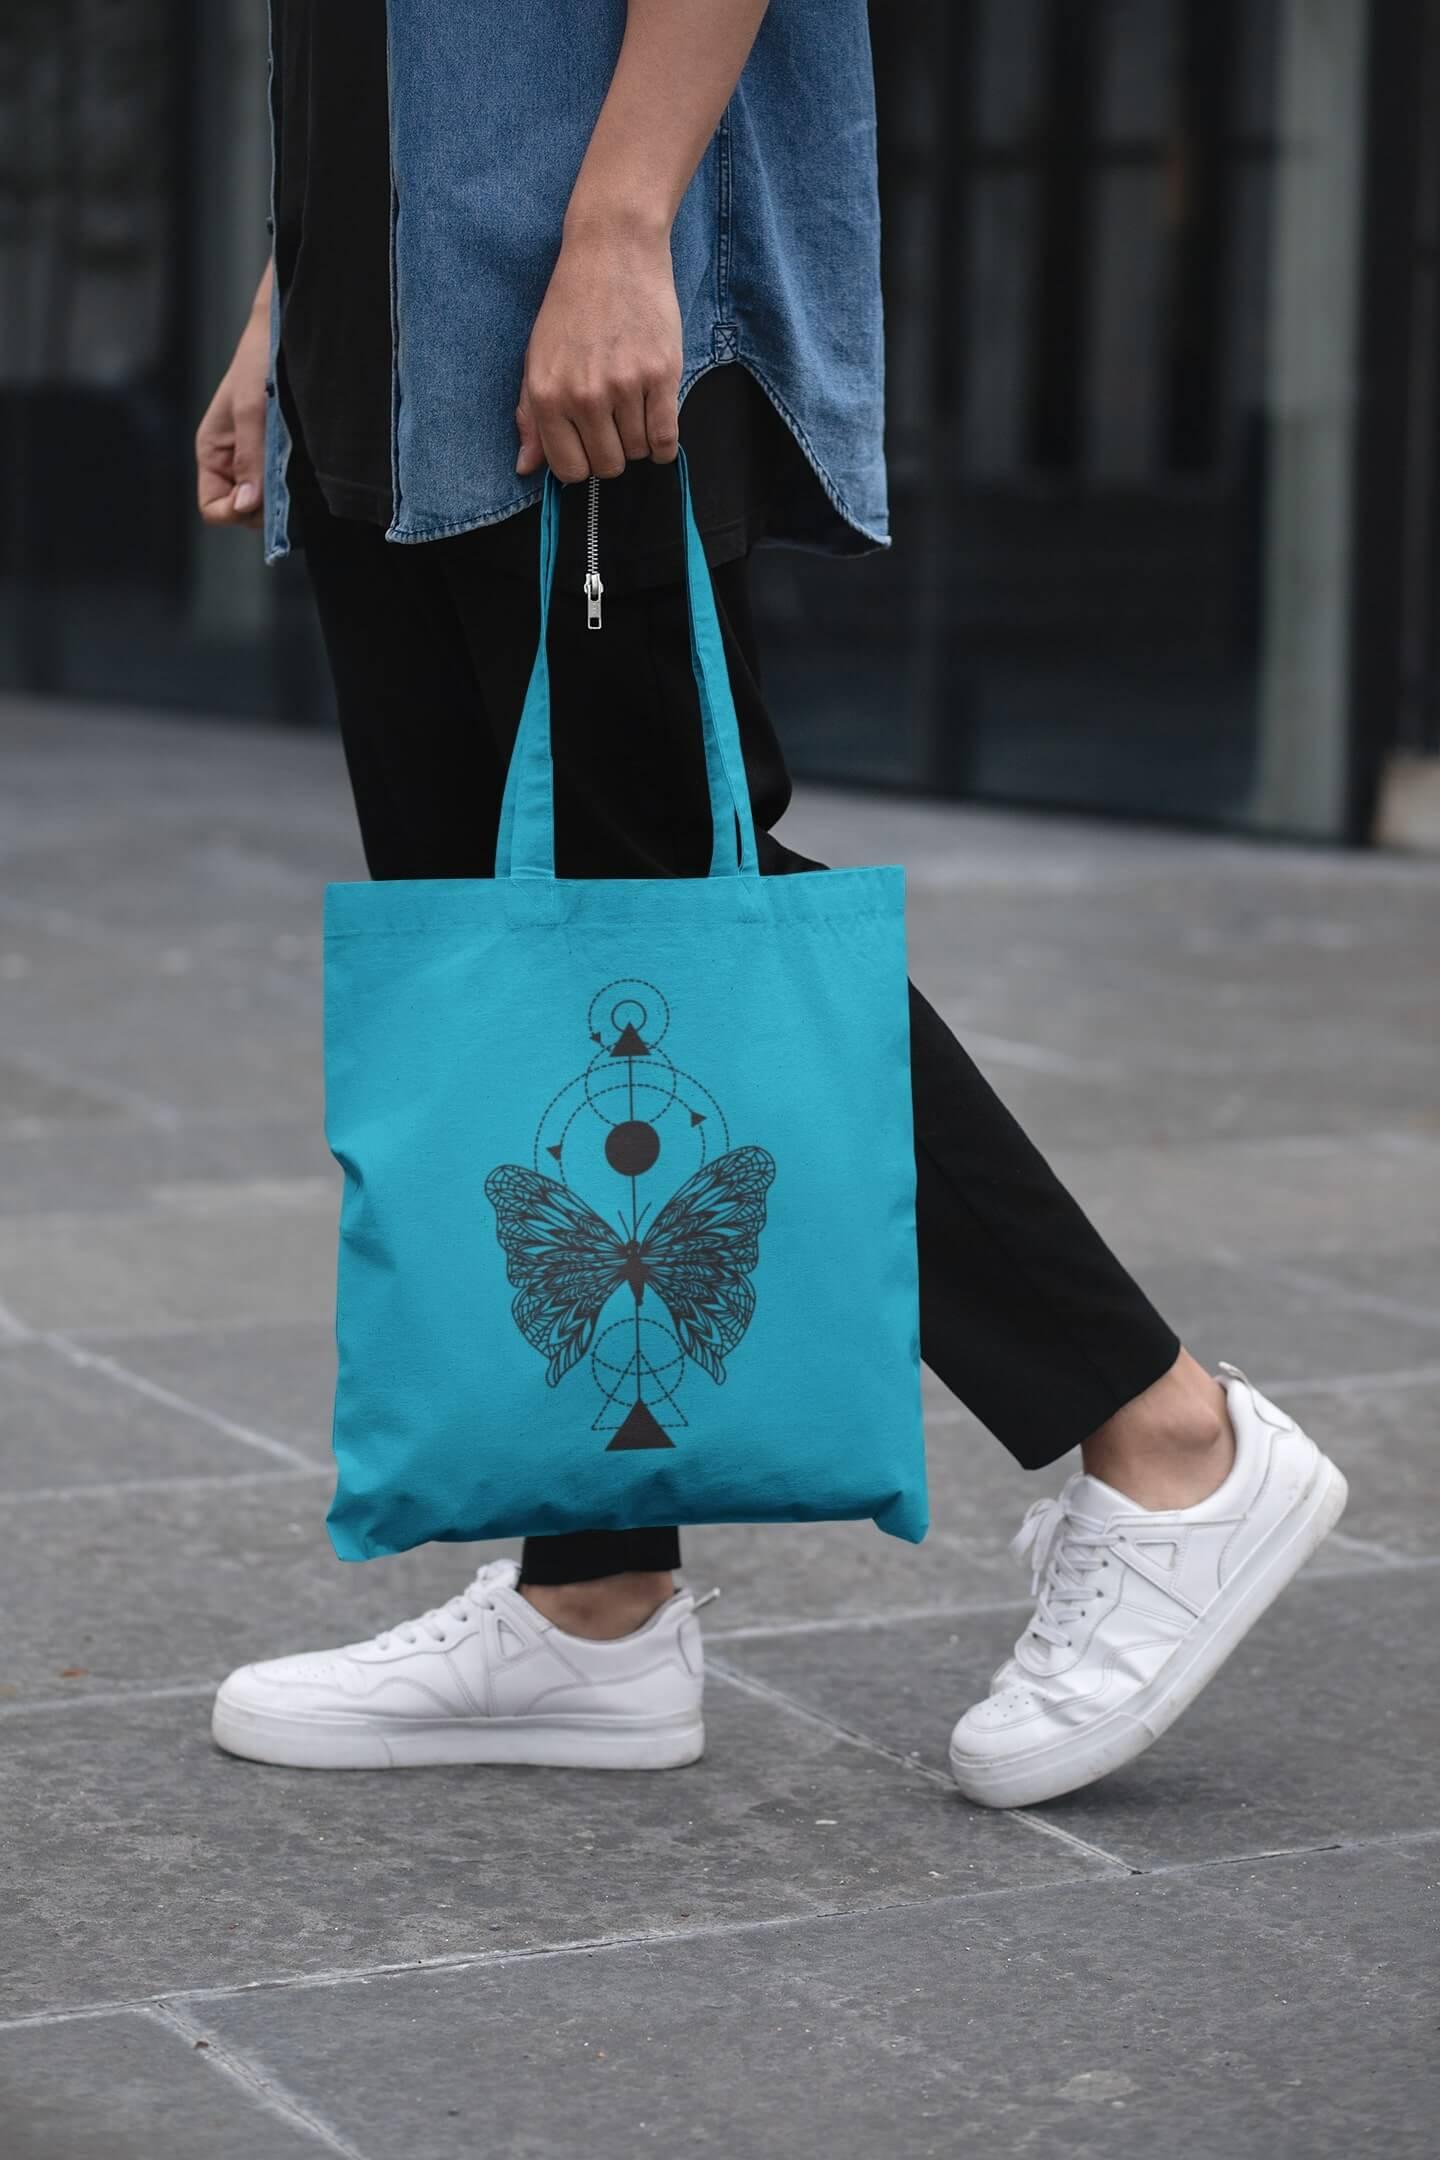 MMO Bavlnená taška Motýľ Farba tašky: Tyrkysová